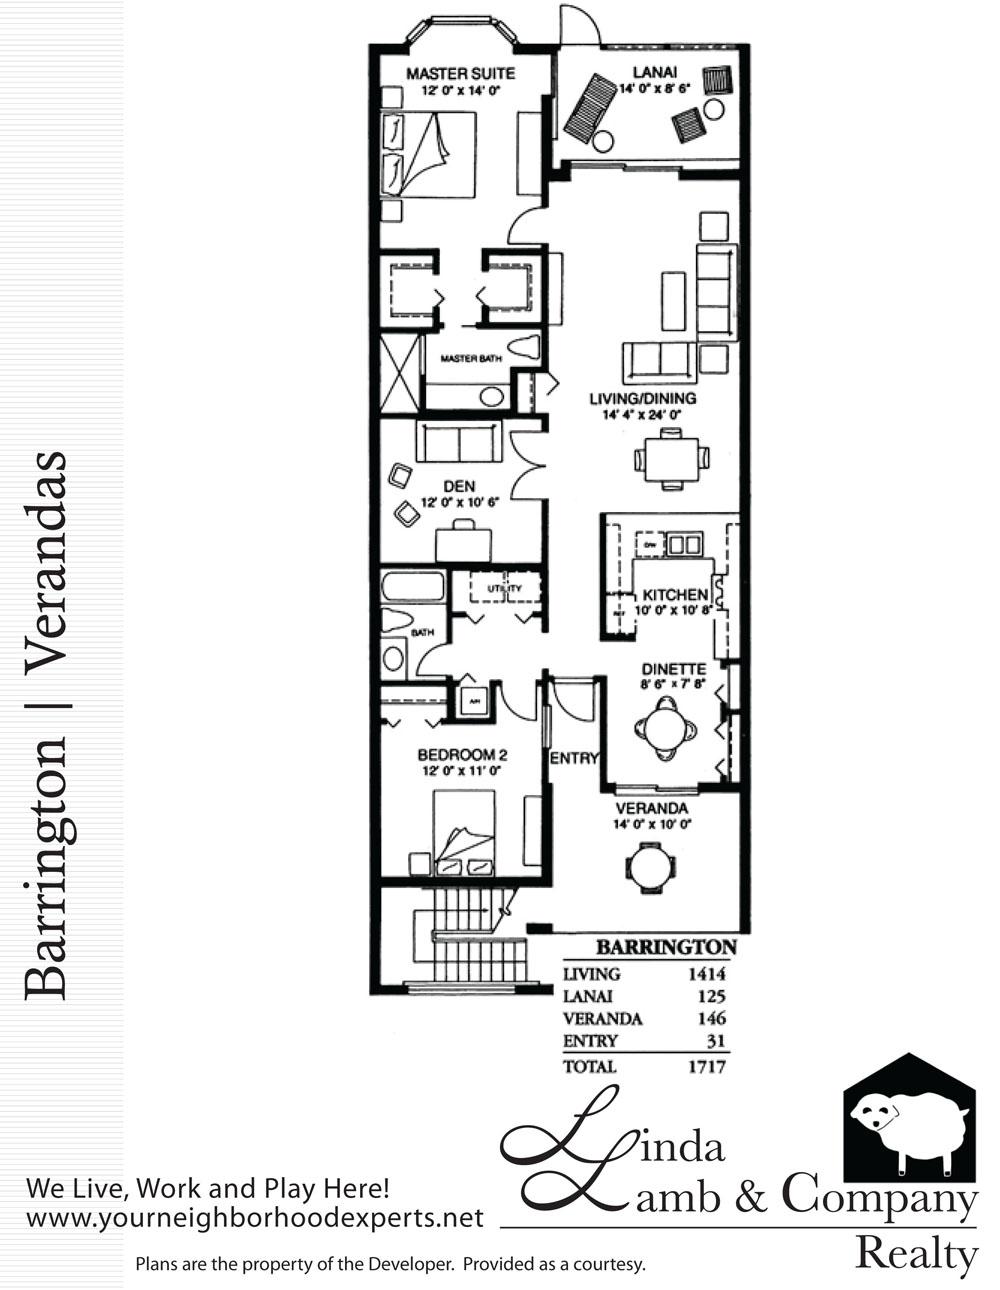 Barrington veranda floor plan heritage palms linda for Barrington floor plan